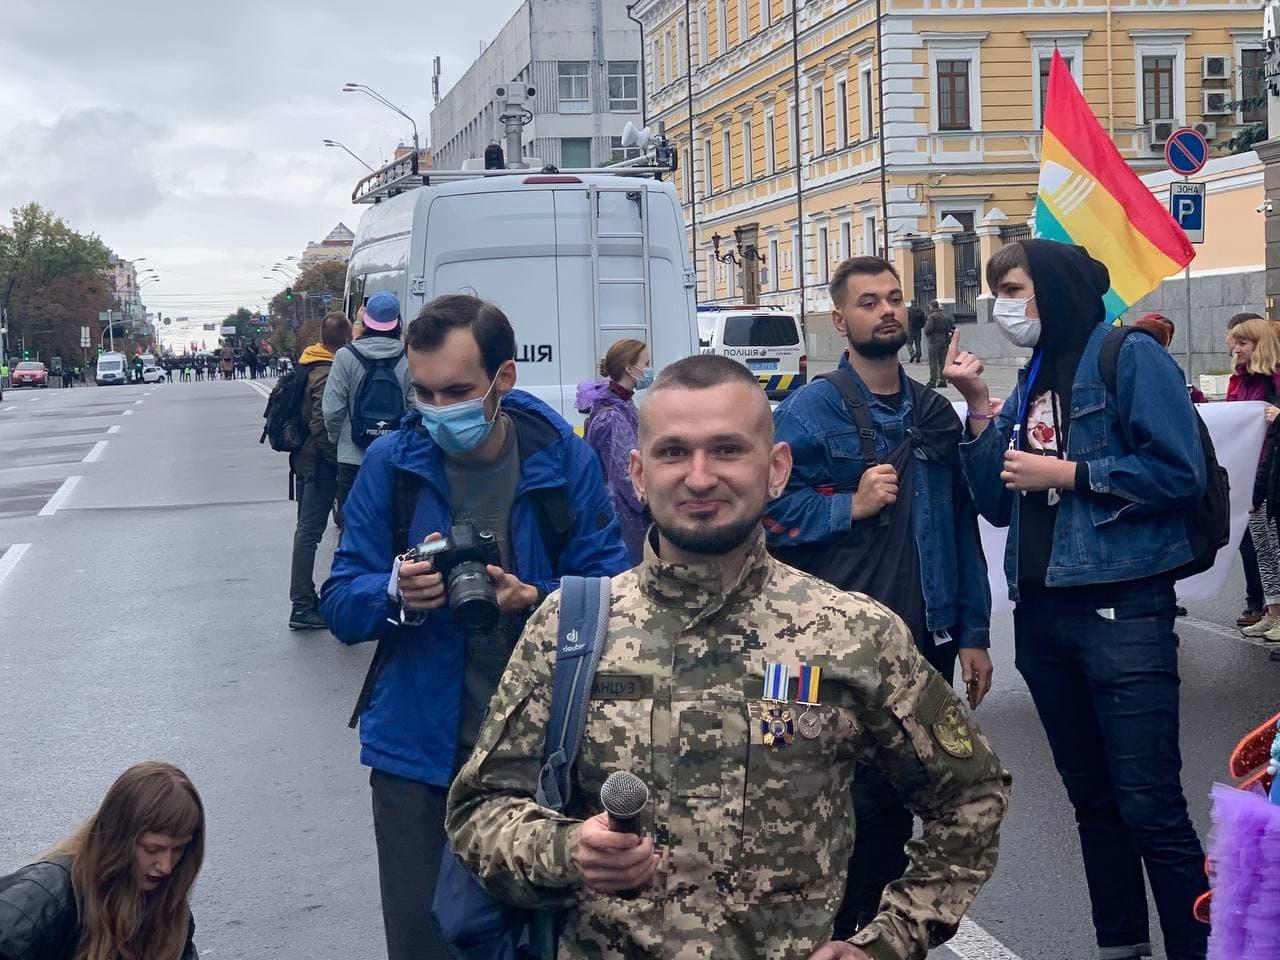 10:17 Участники ЛГБТ прайда скандируют: `Бунтуй, кохай, права не отдавай`.